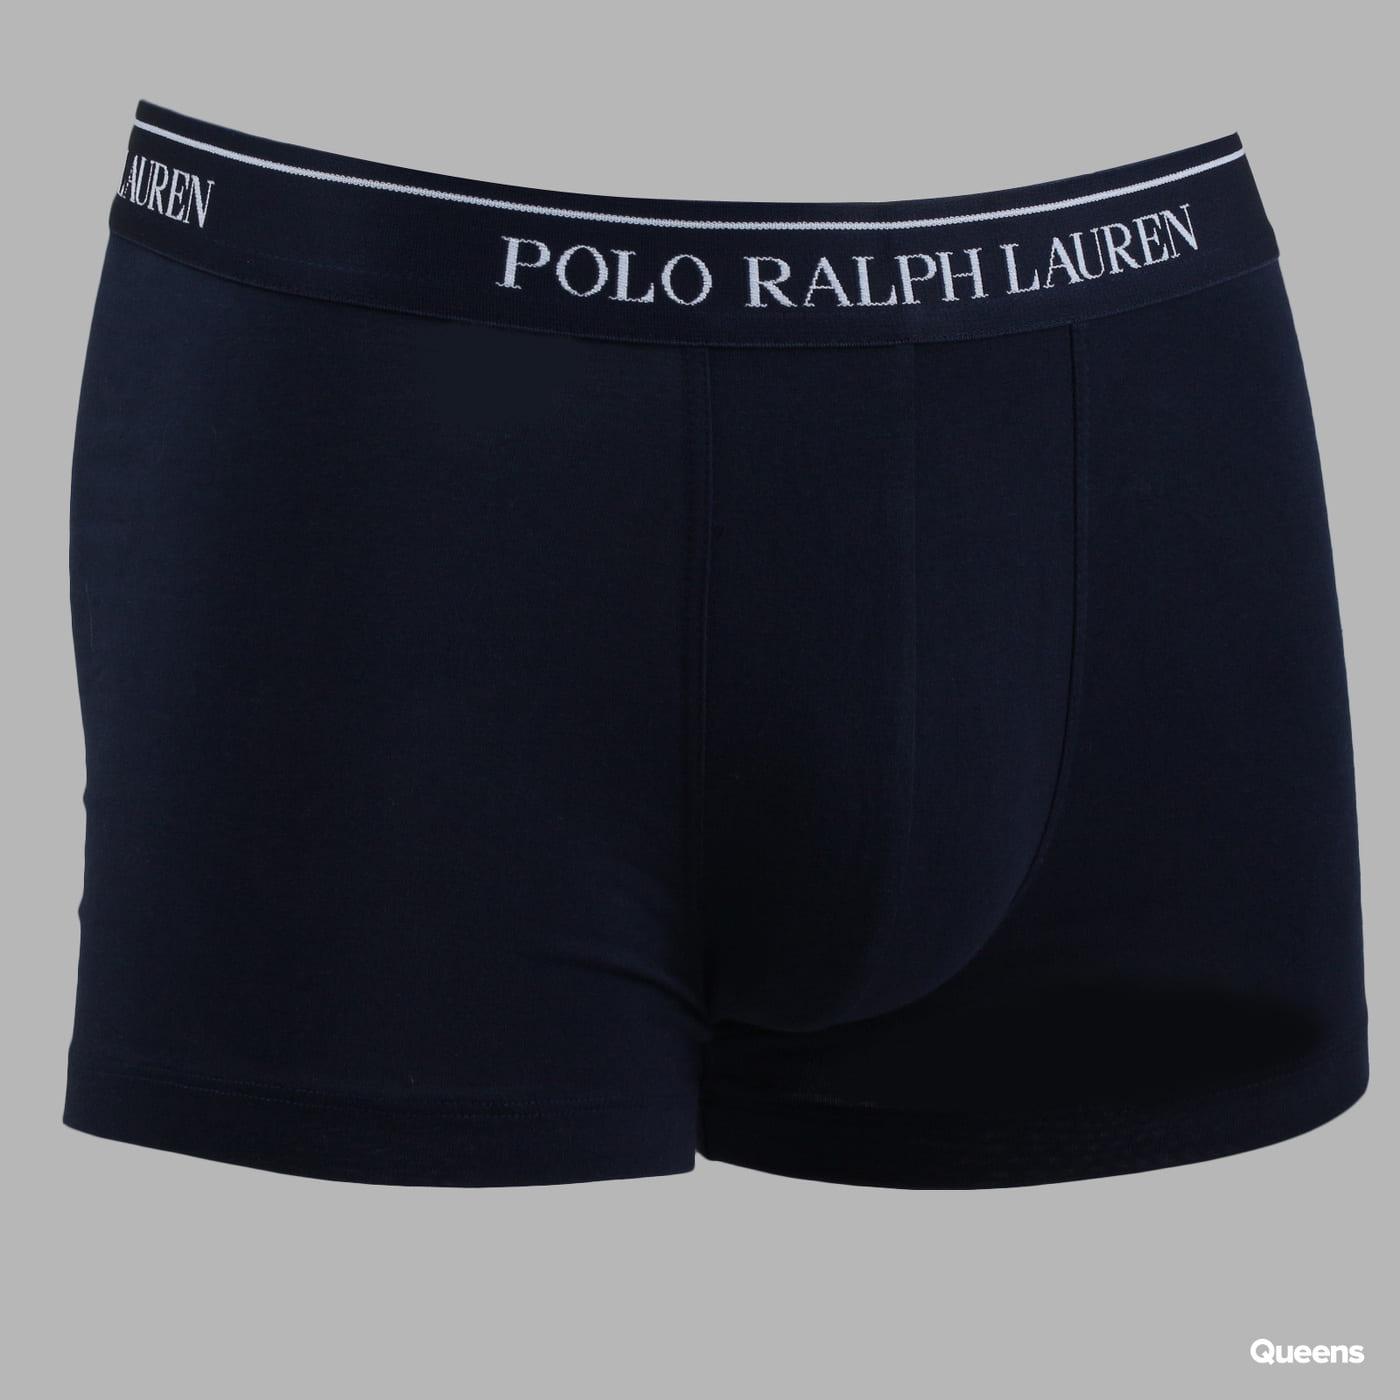 Polo Ralph Lauren 3 Pack Classic Trunks C/O Marine